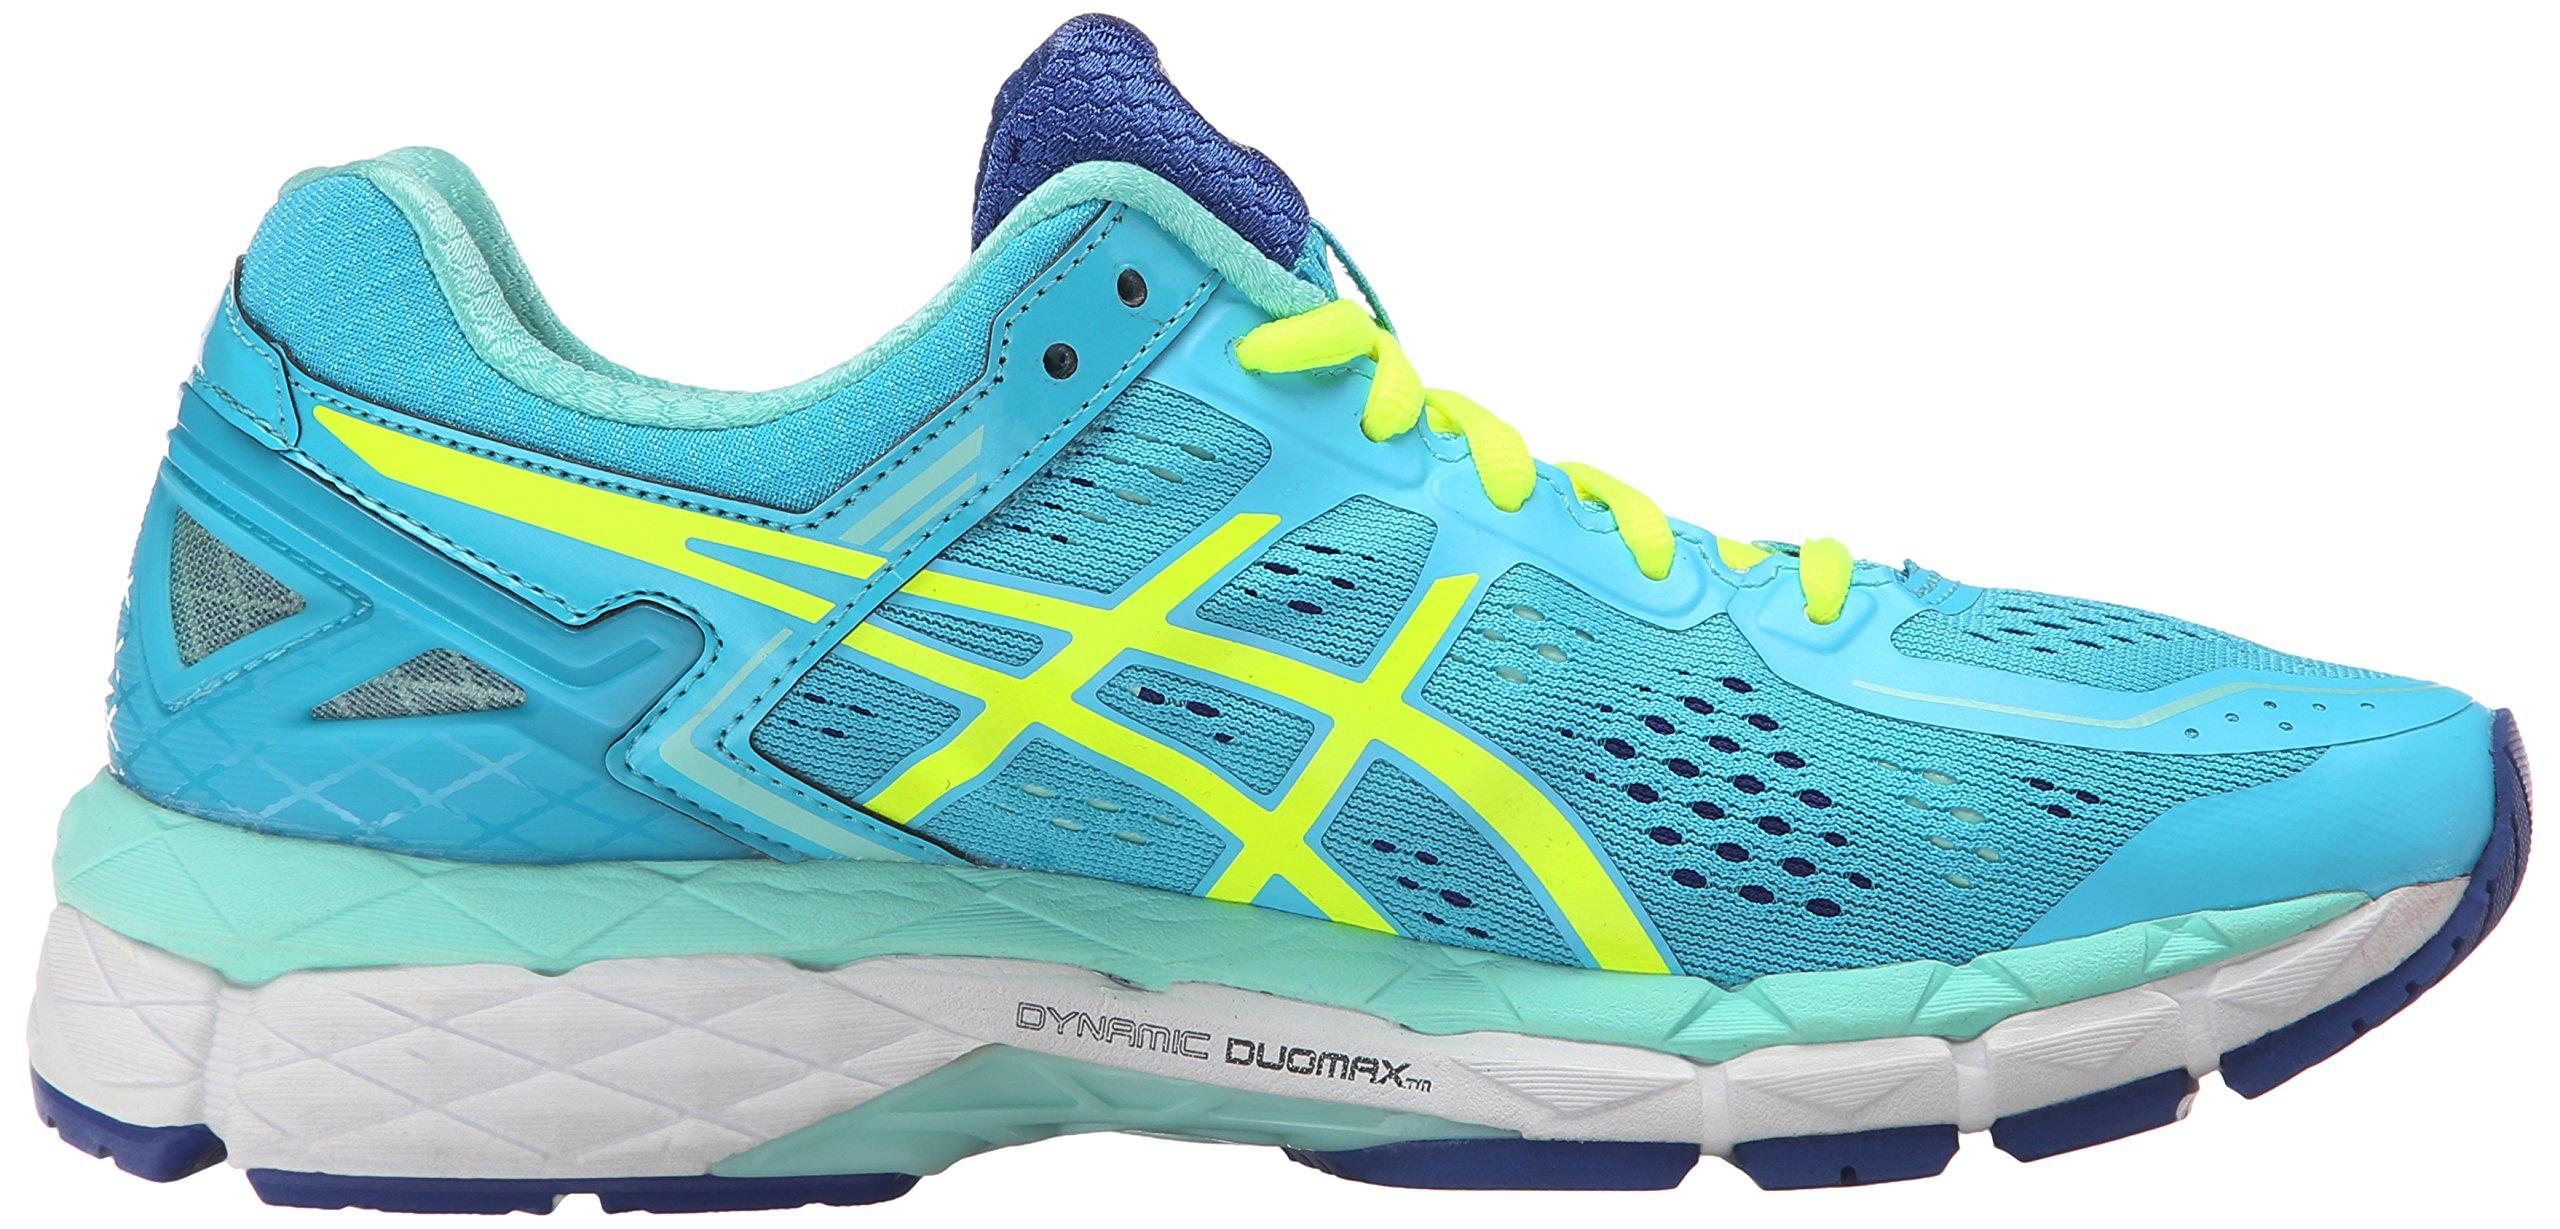 ASICS Women's Gel Kayano 22 Running Shoe, Ice Blue/Flash Yellow/Blue, 7.5 M US